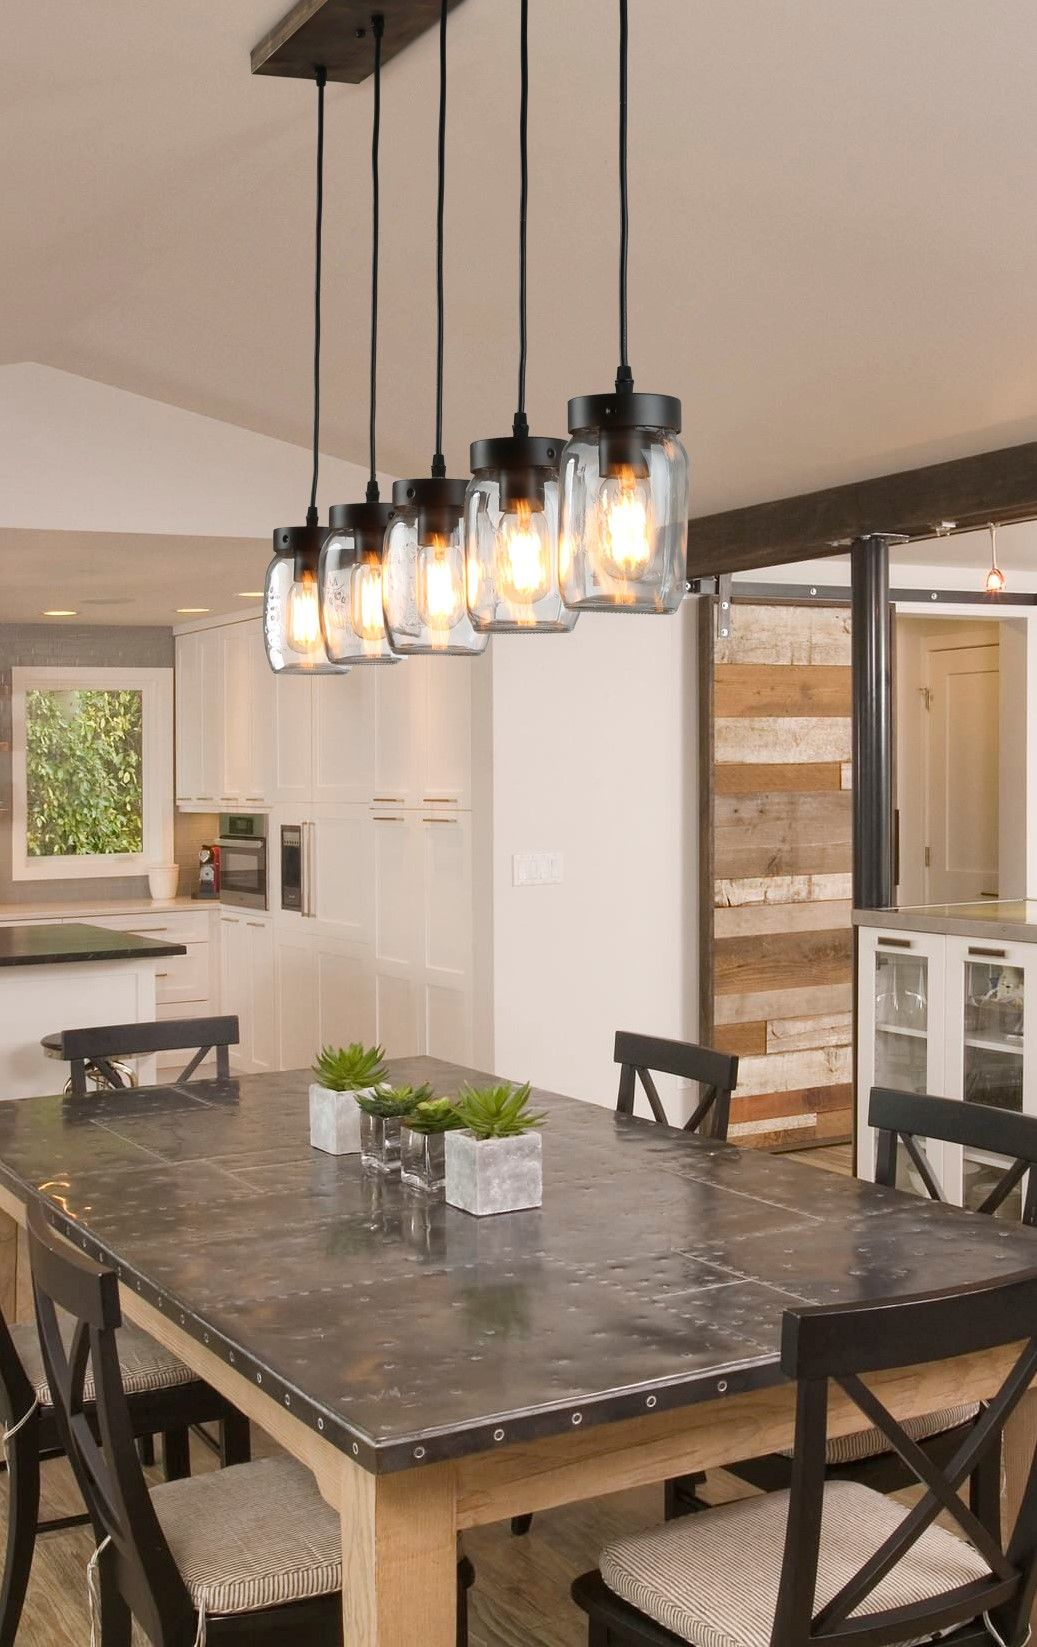 Linear Mason Jar Chandelier 5 Lights Kitchen Table Lighting Dining Table Lighting Rustic Dining Room Lighting